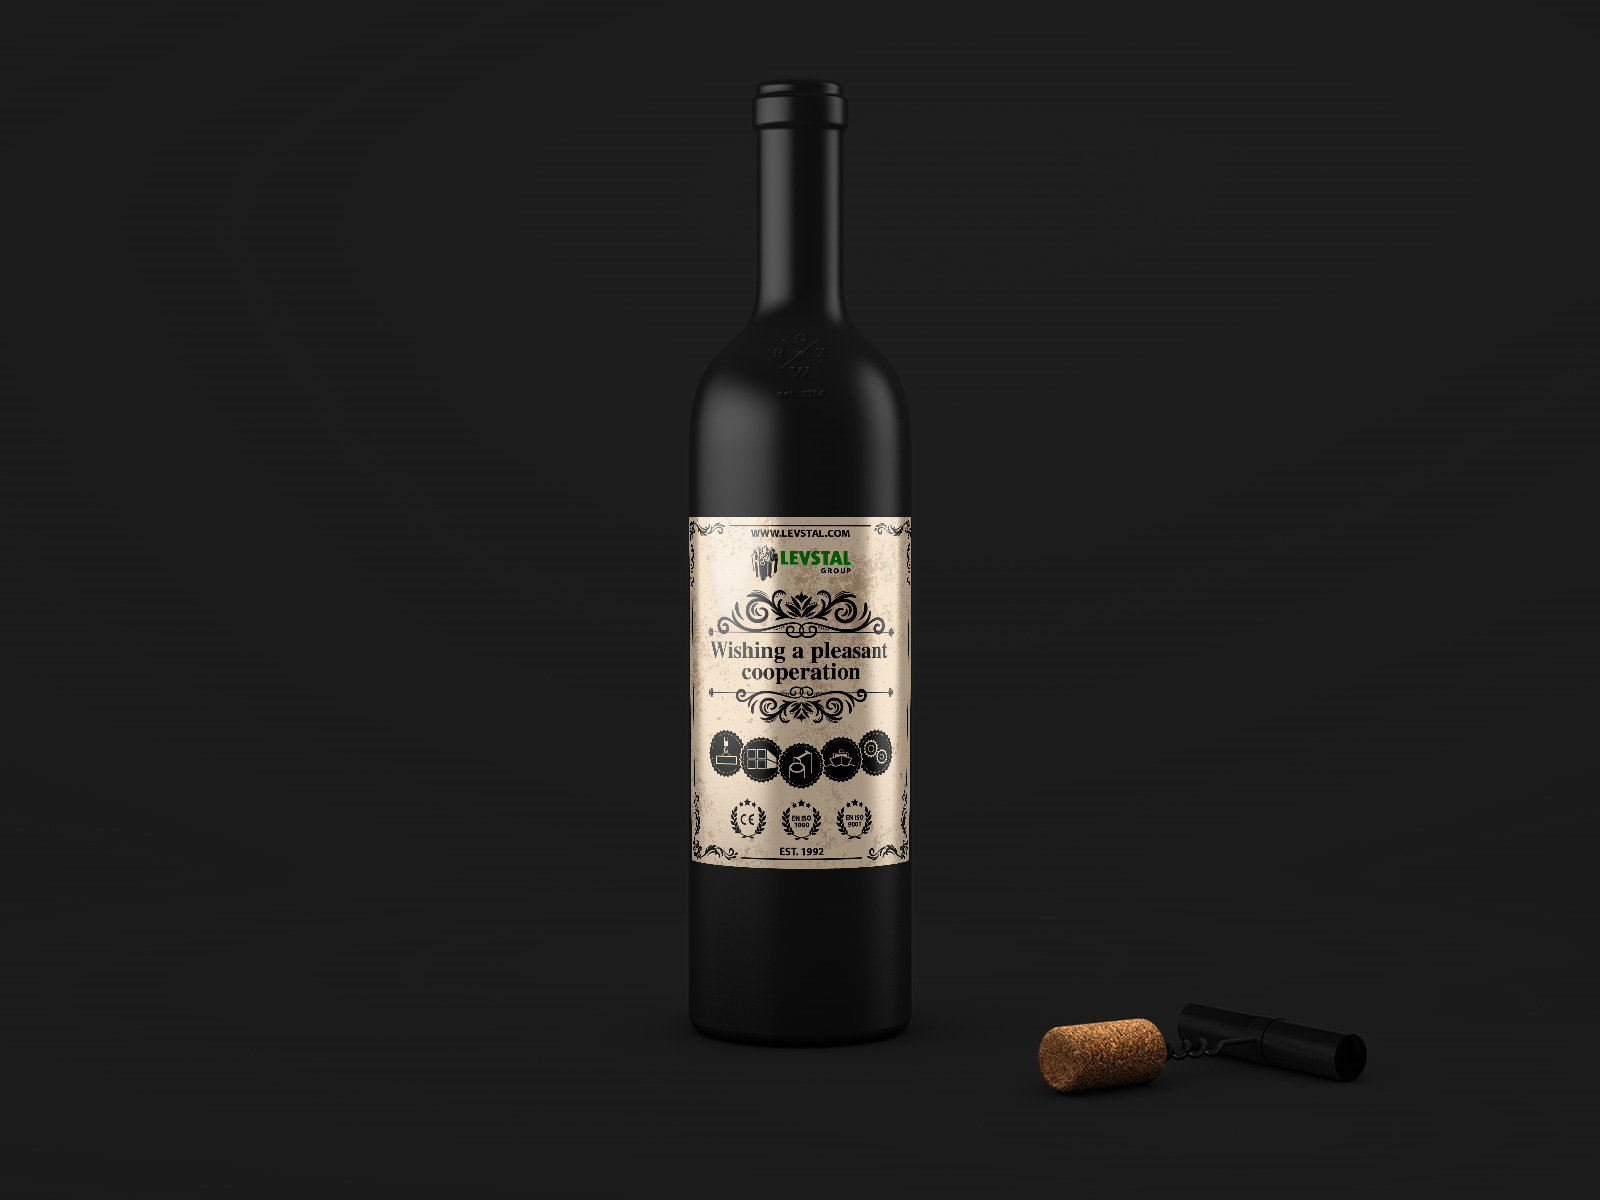 levstal wine